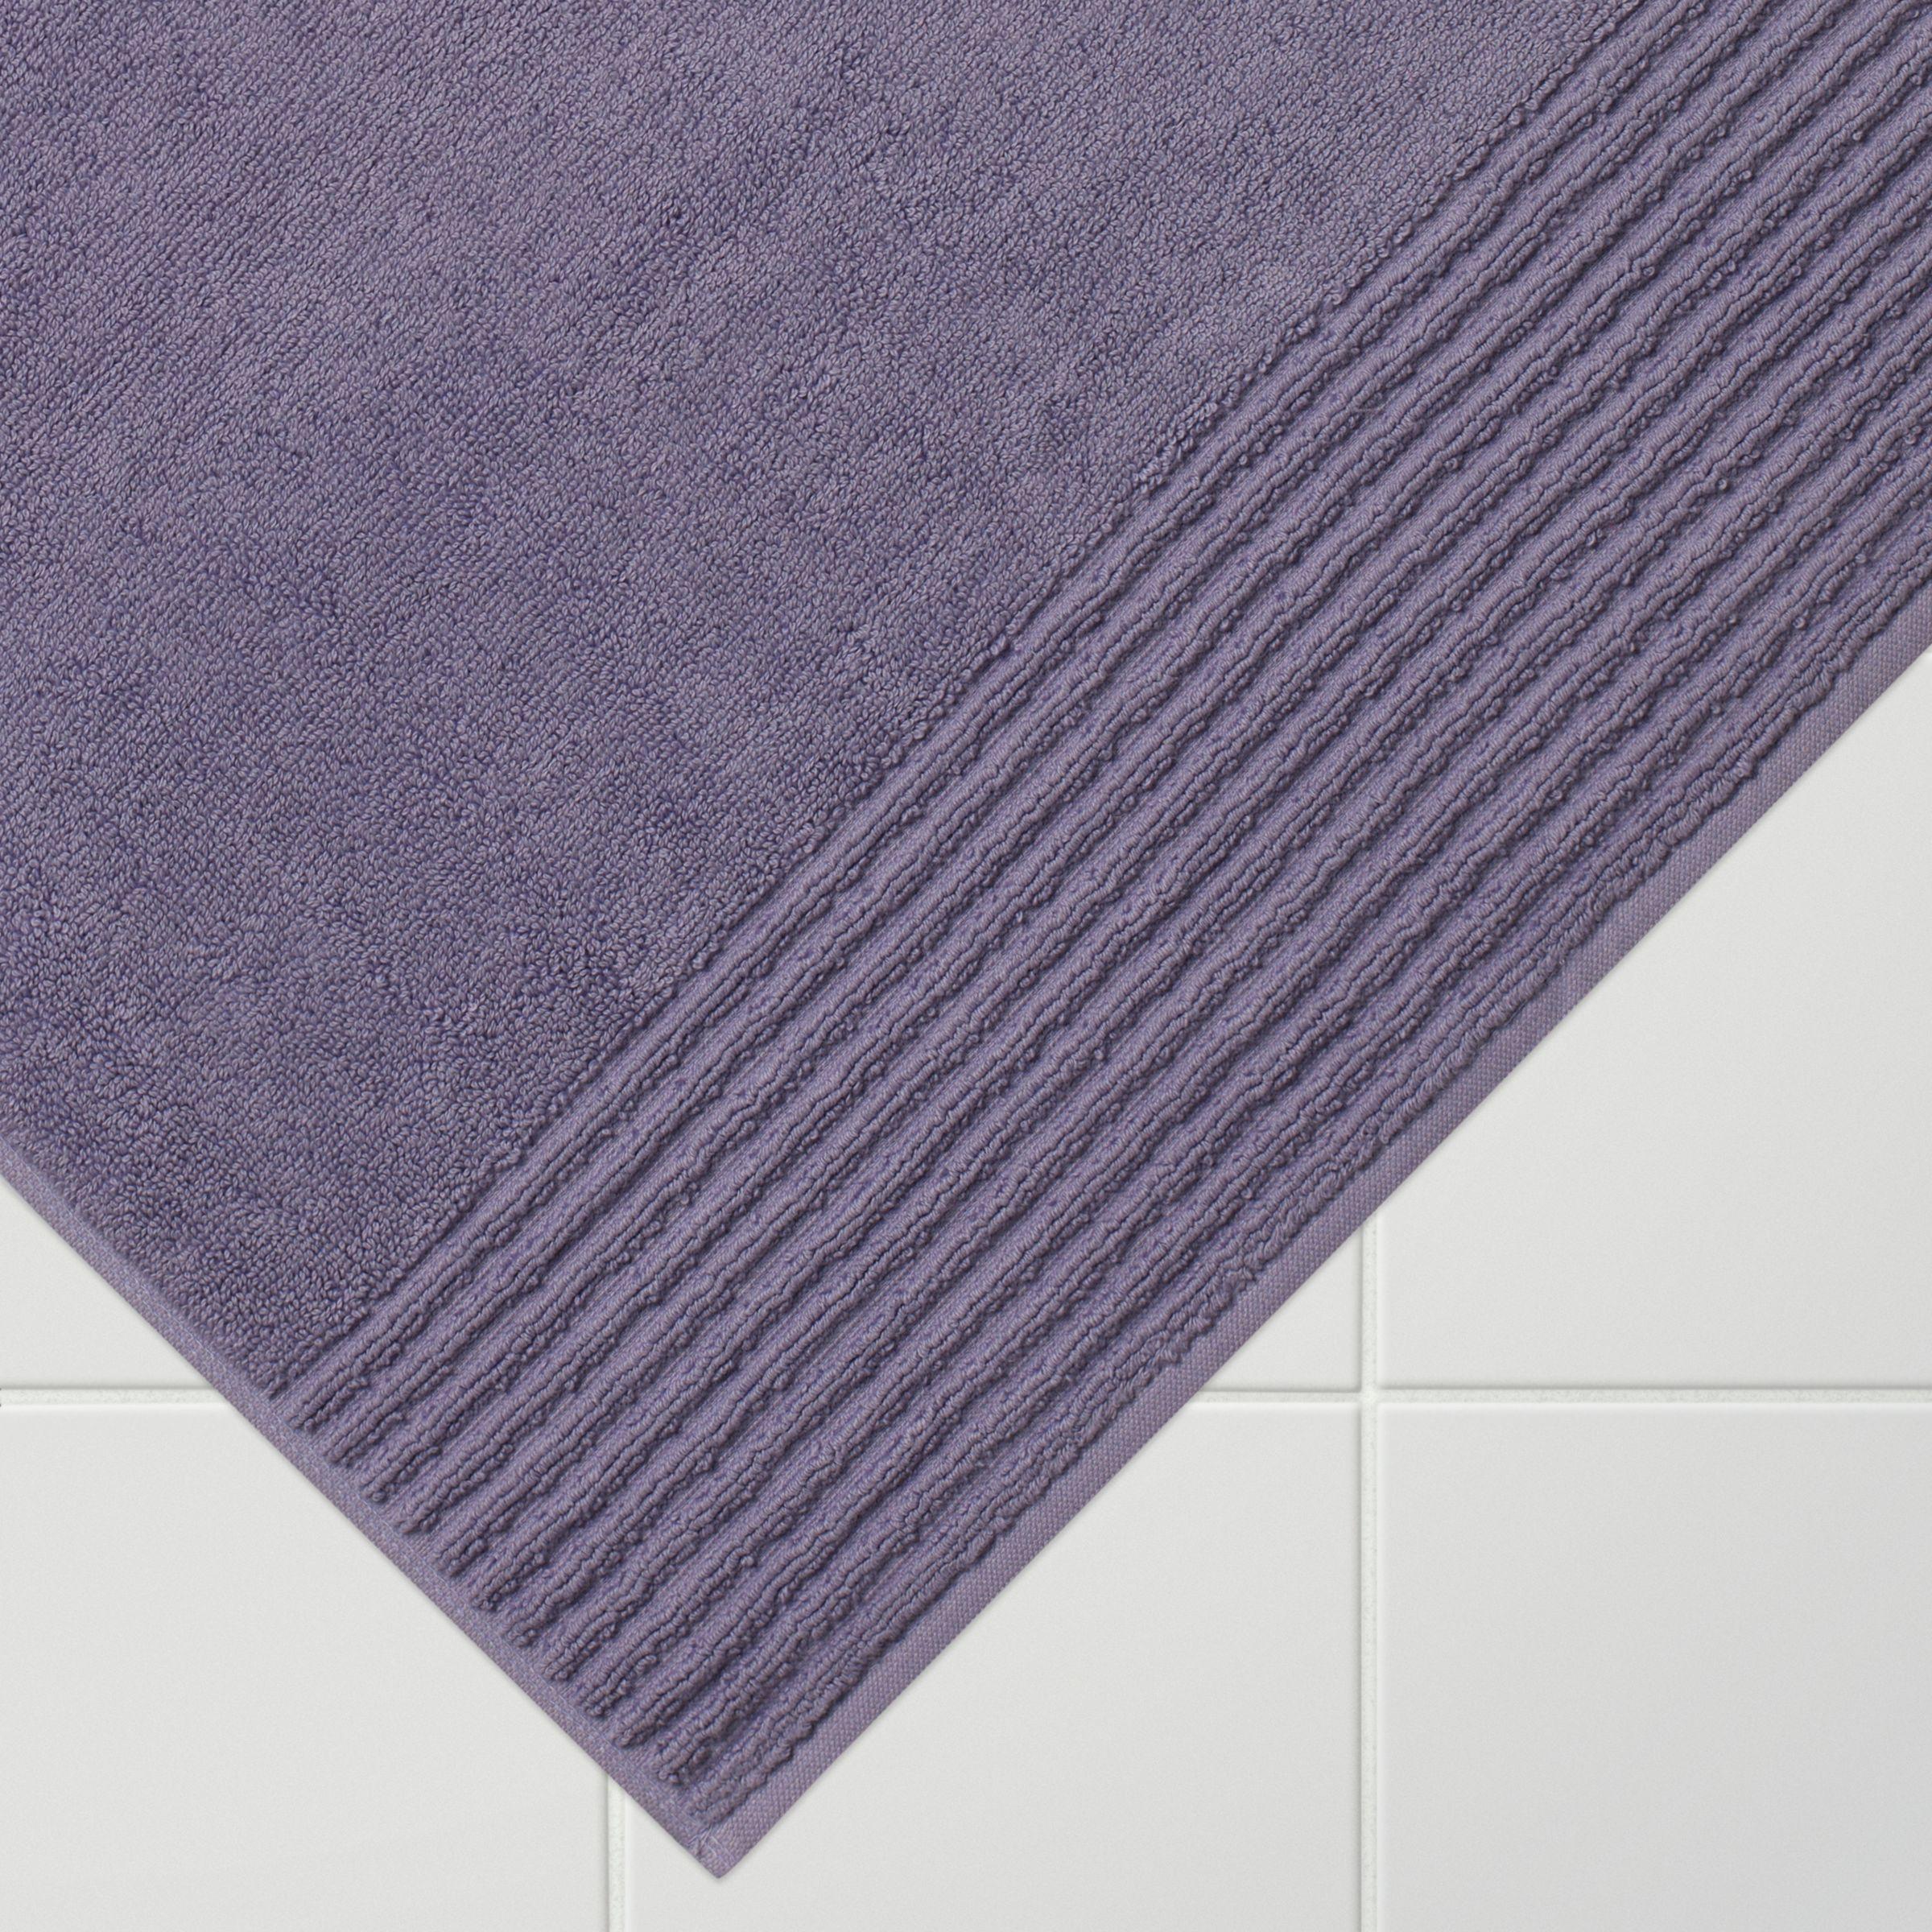 4a8219332b John Lewis & Partners Egyptian Cotton Bath Mat, Pale Cassis